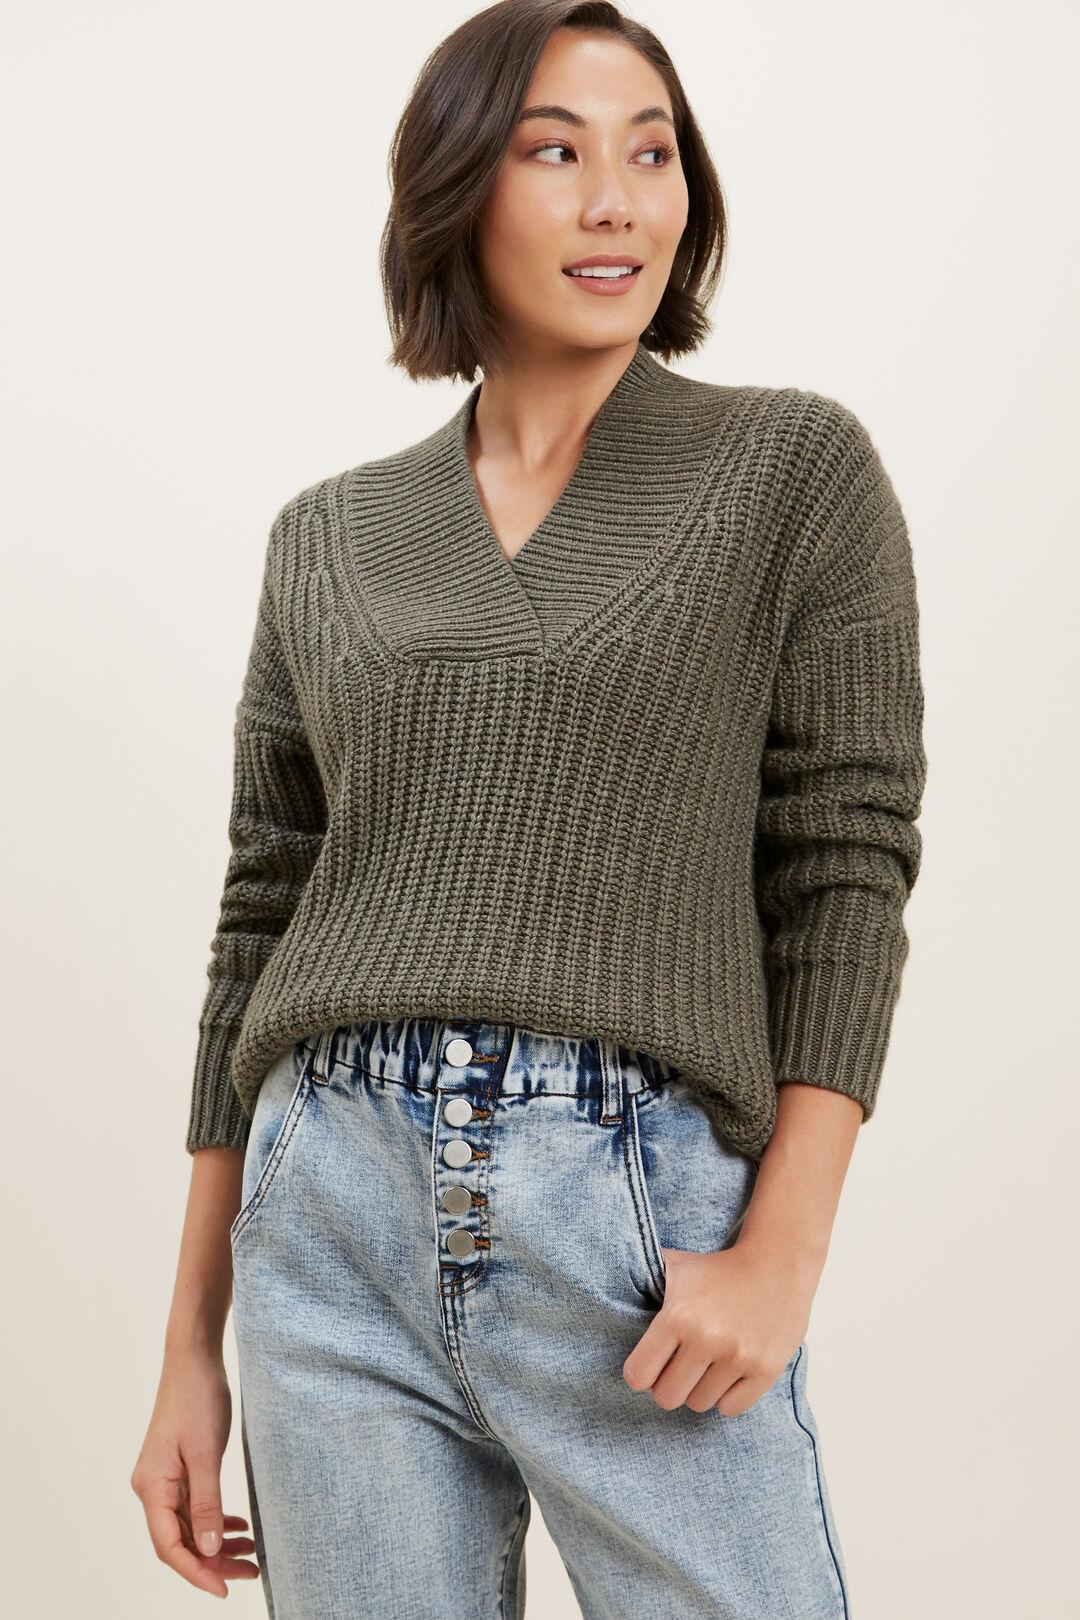 Shawl Collar Sweater  OLIVE KHAKI MARLE  hi-res